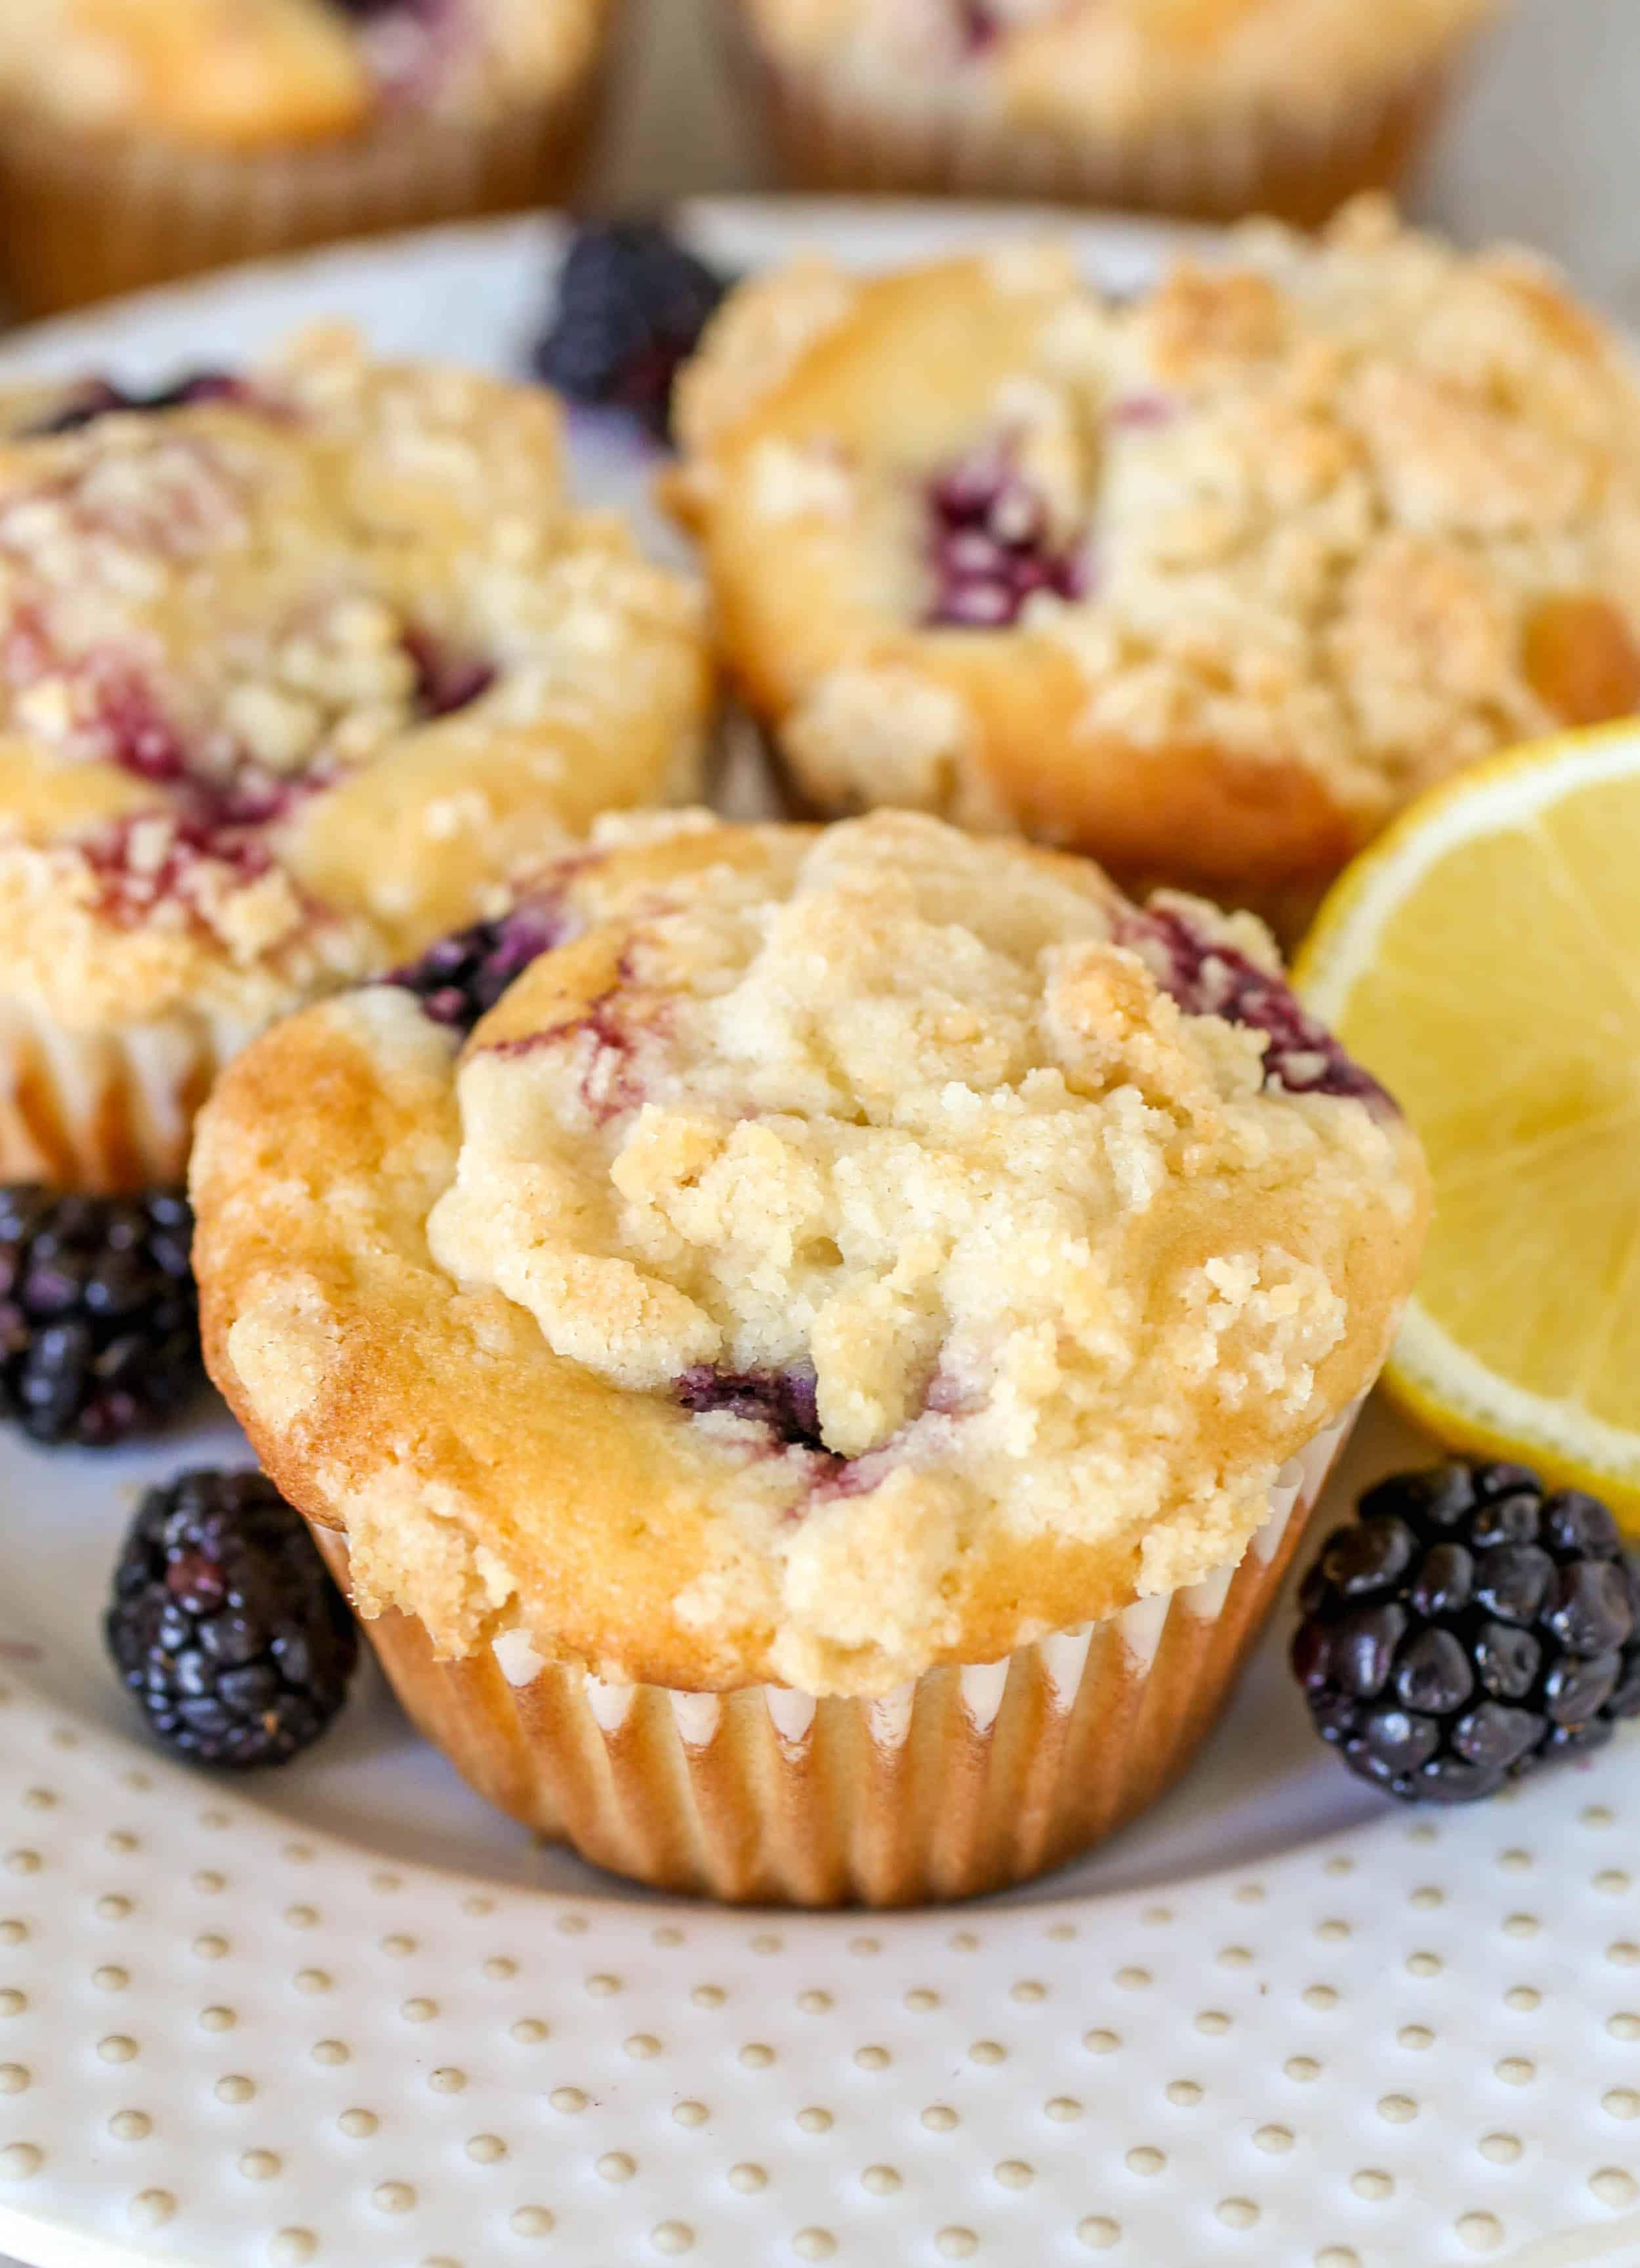 Blackberry Lemon Muffins - Sprinkle Some Sugar